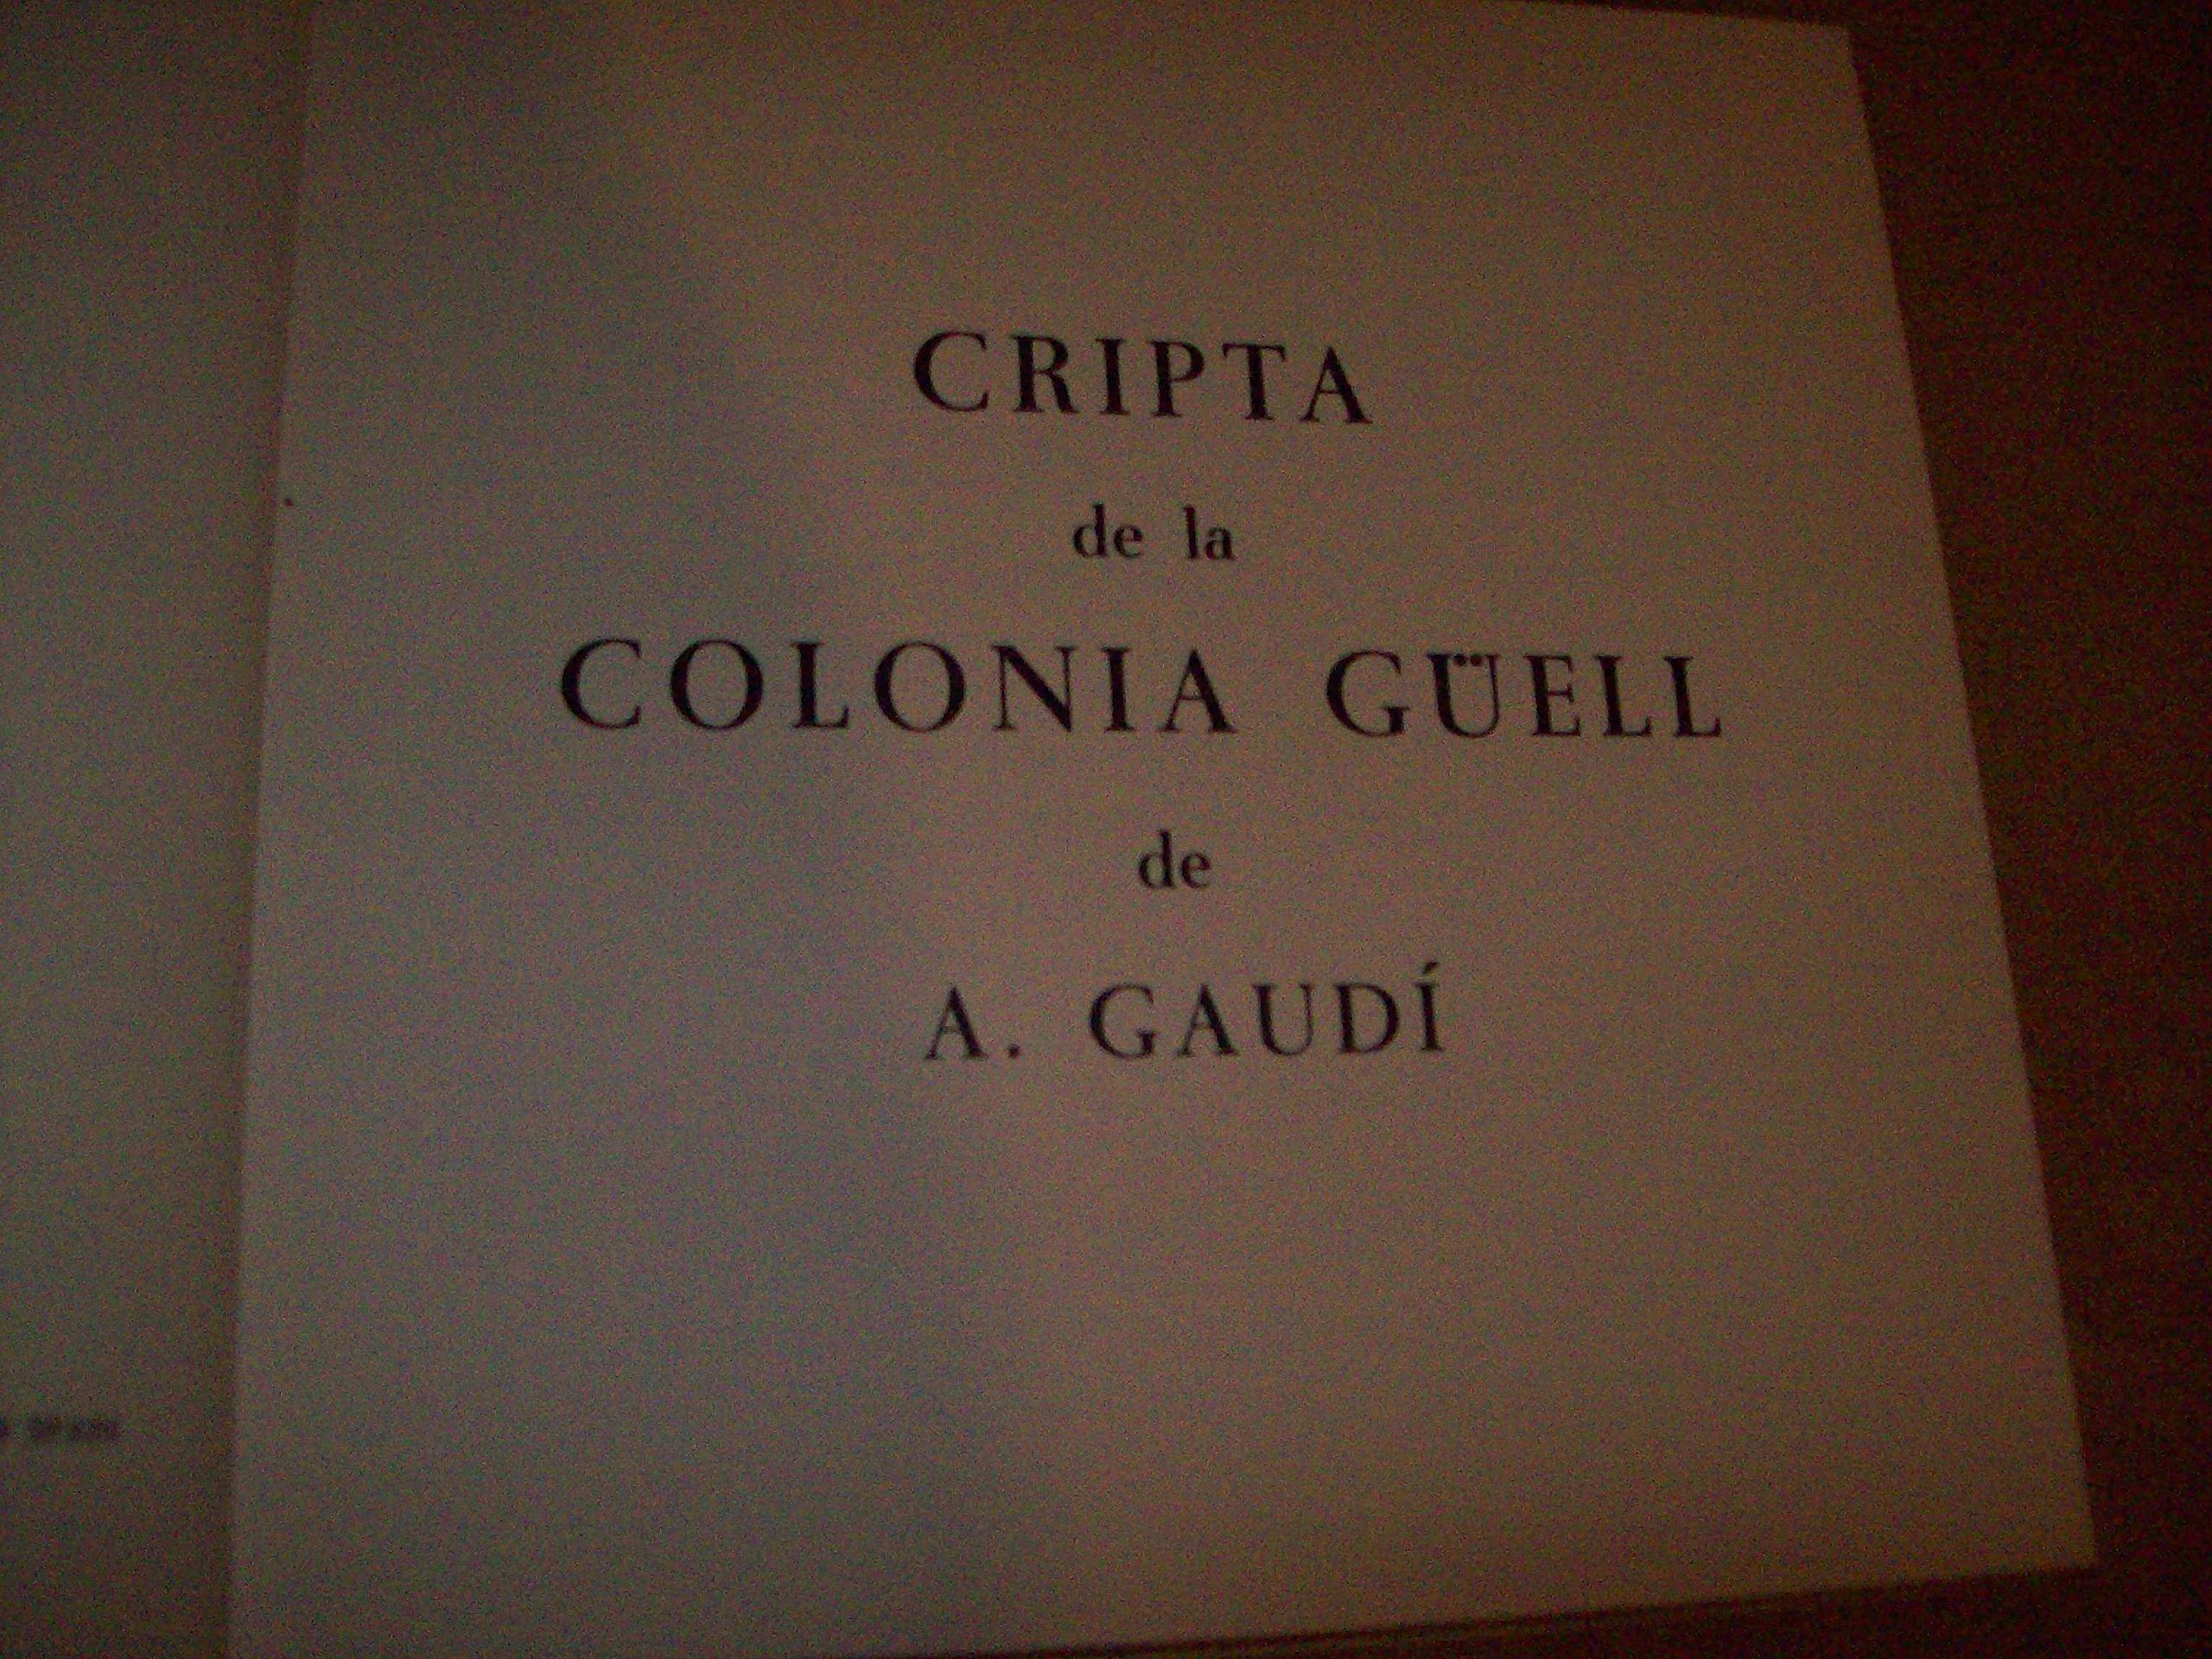 Cripta de la Colonia Guell de A. Gaudi.: Josep Lluis & GAUDI, Antonio. SERT: Amazon.com: Books